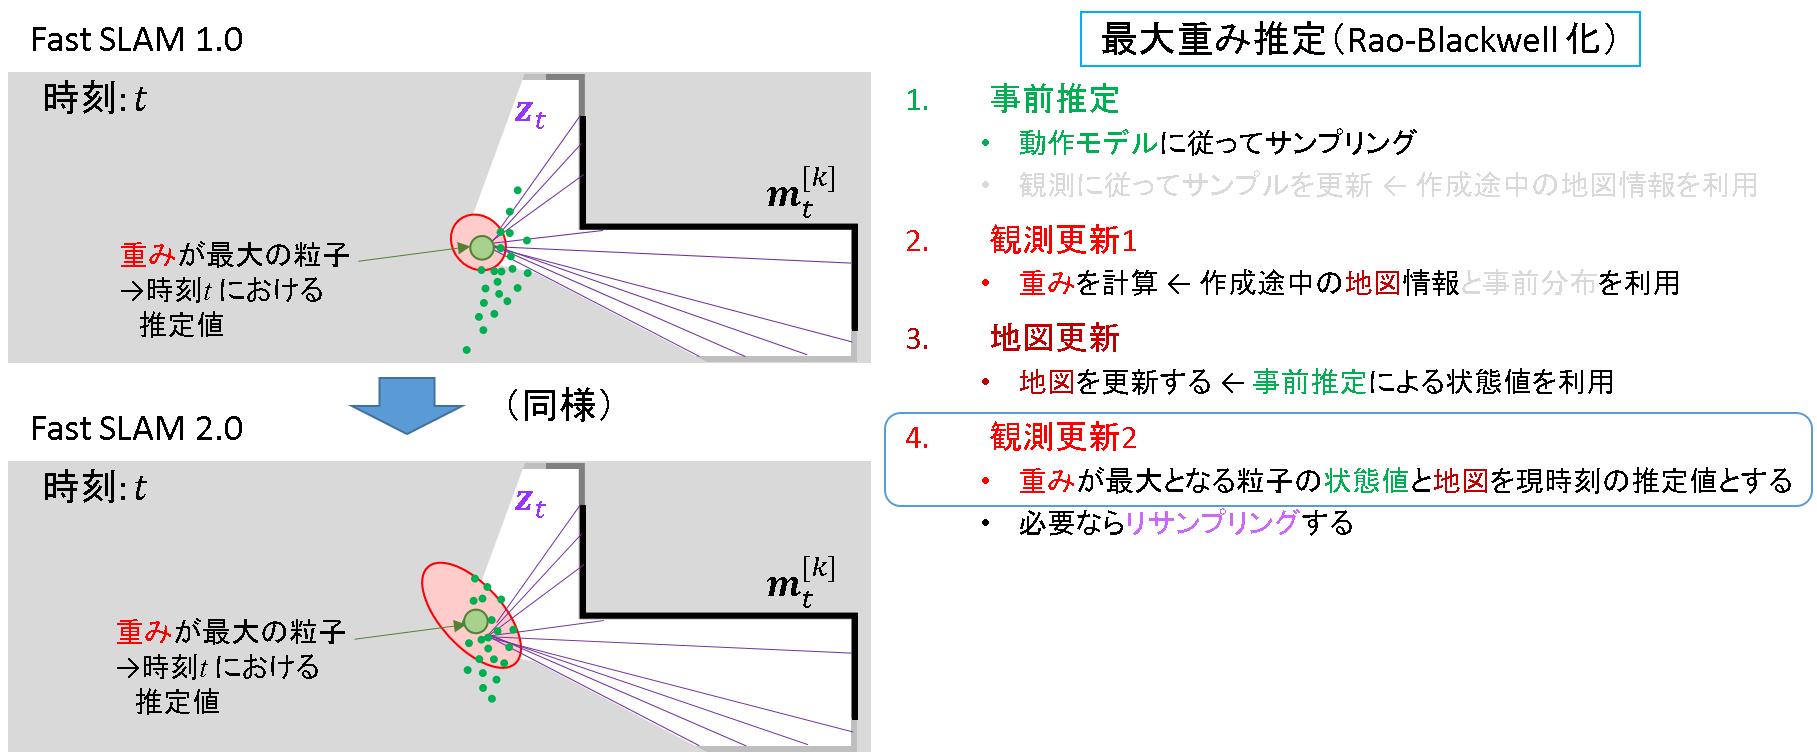 80_FastSLAM2.0_観測更新2_1.png